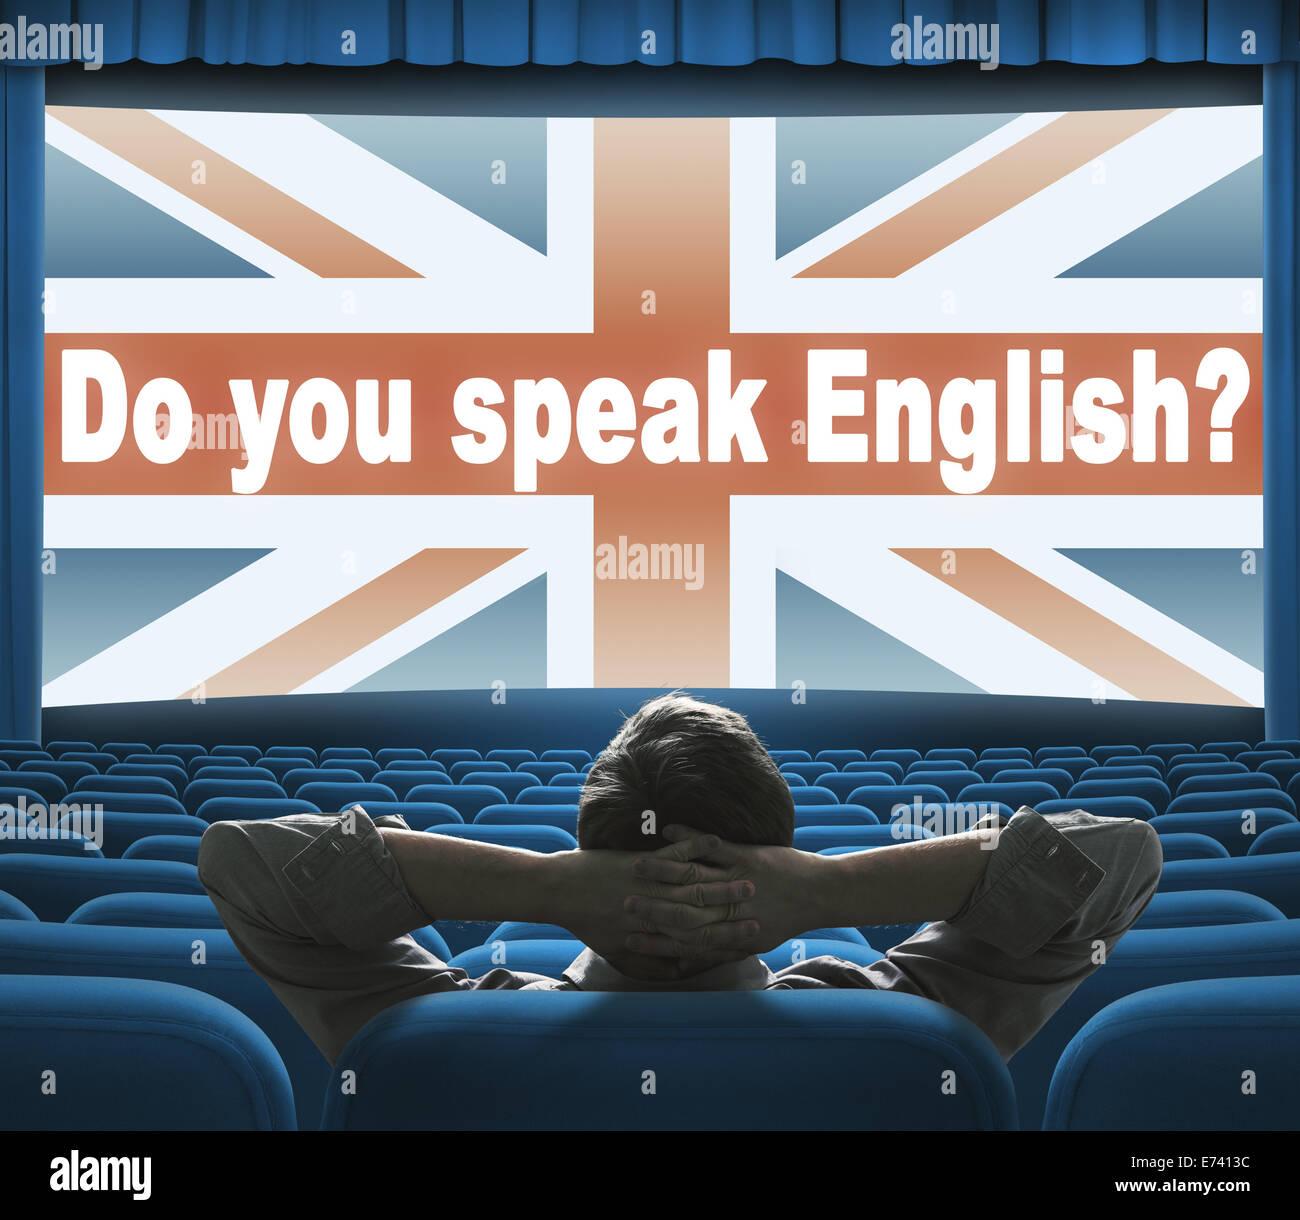 'Do you speak English?' phrase on wide cinema screen - Stock Image